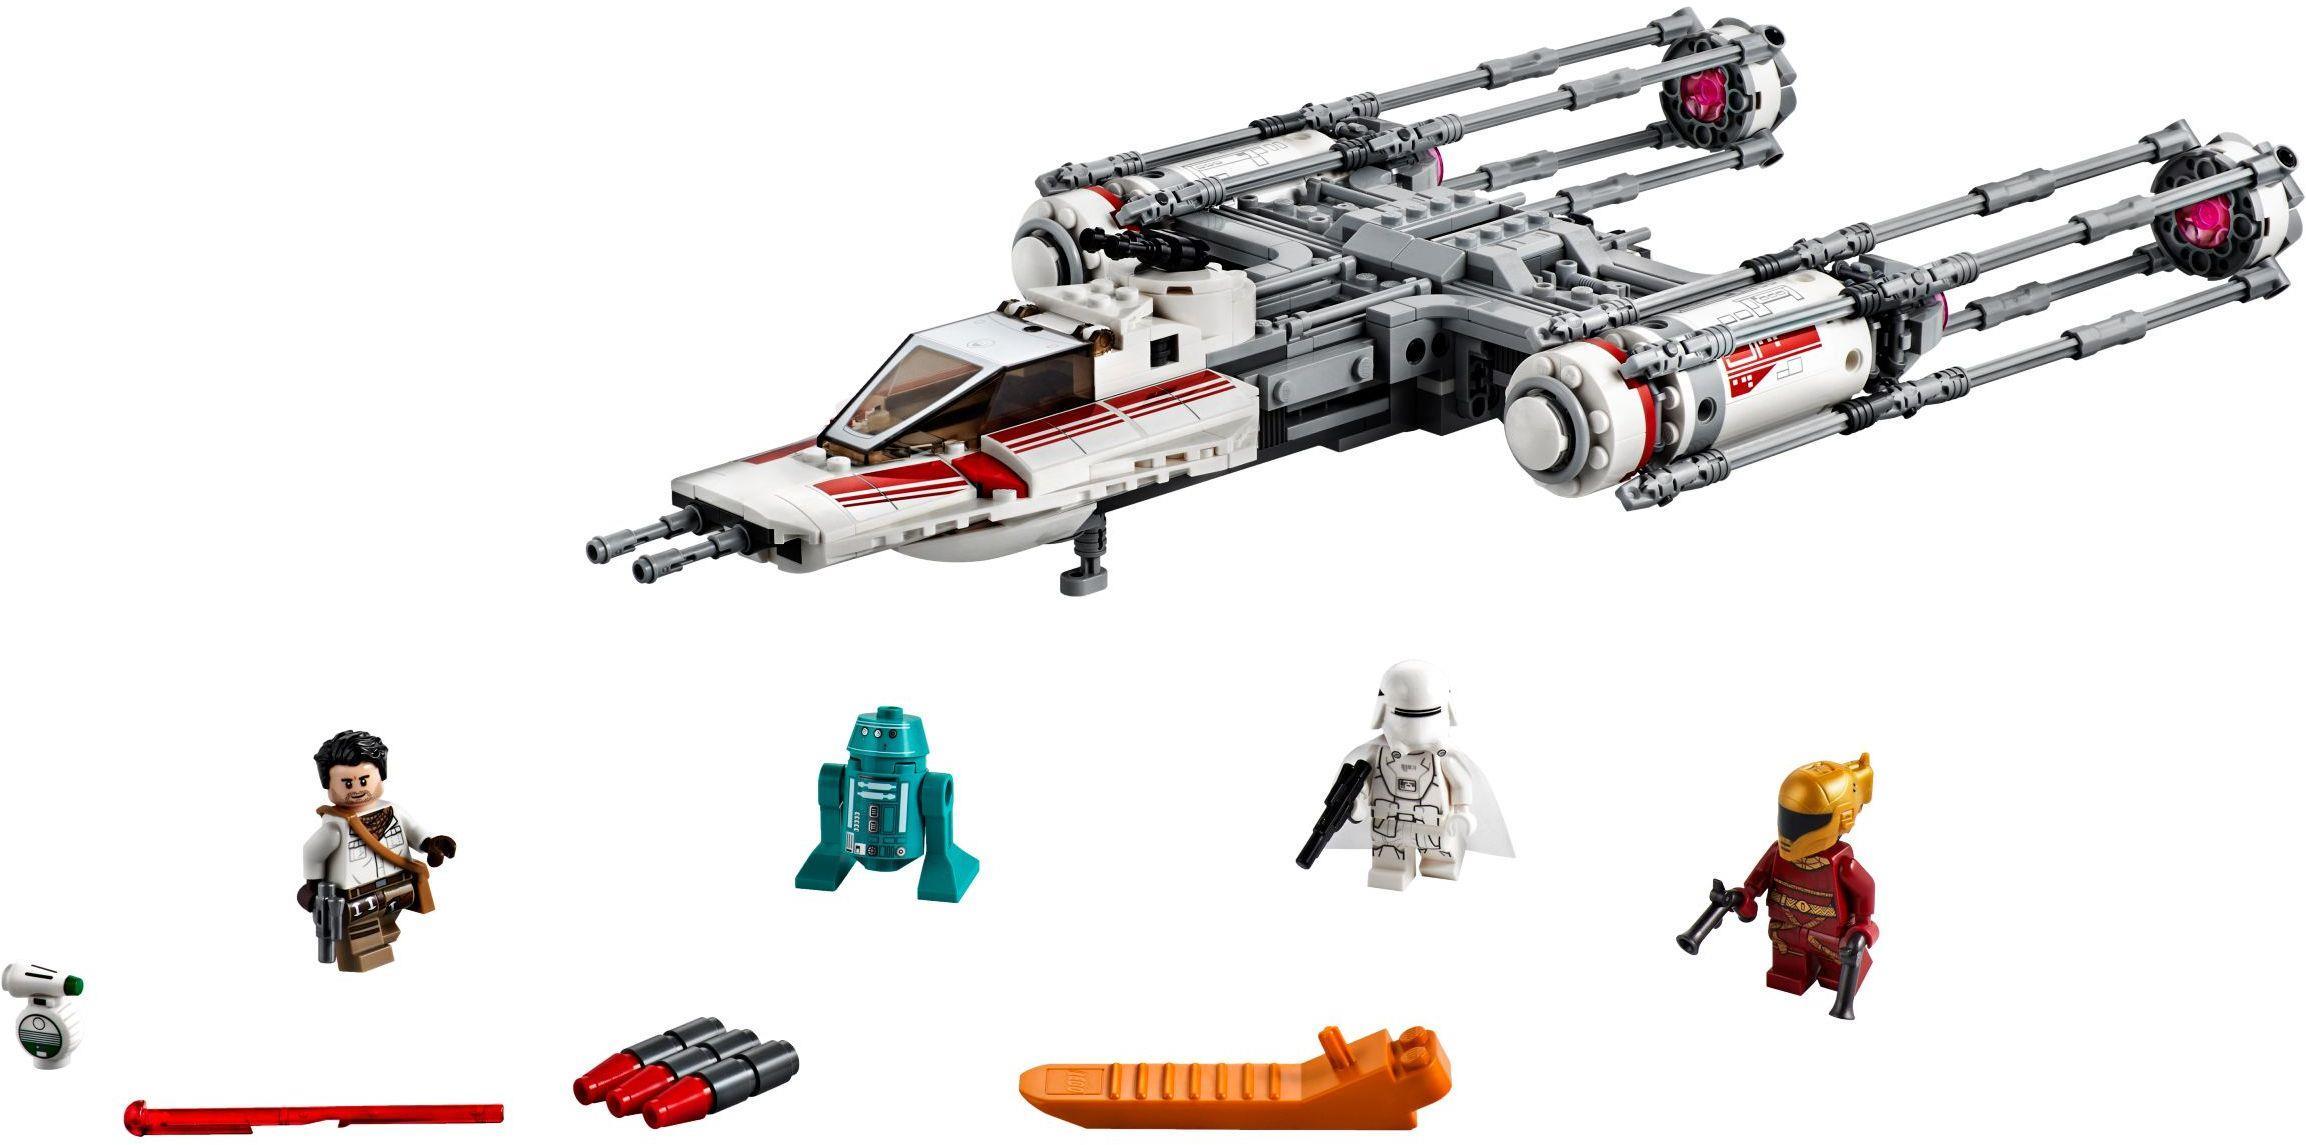 Lego 75249 Star Wars Resistance Y Wing Starfighter Brickeconomy